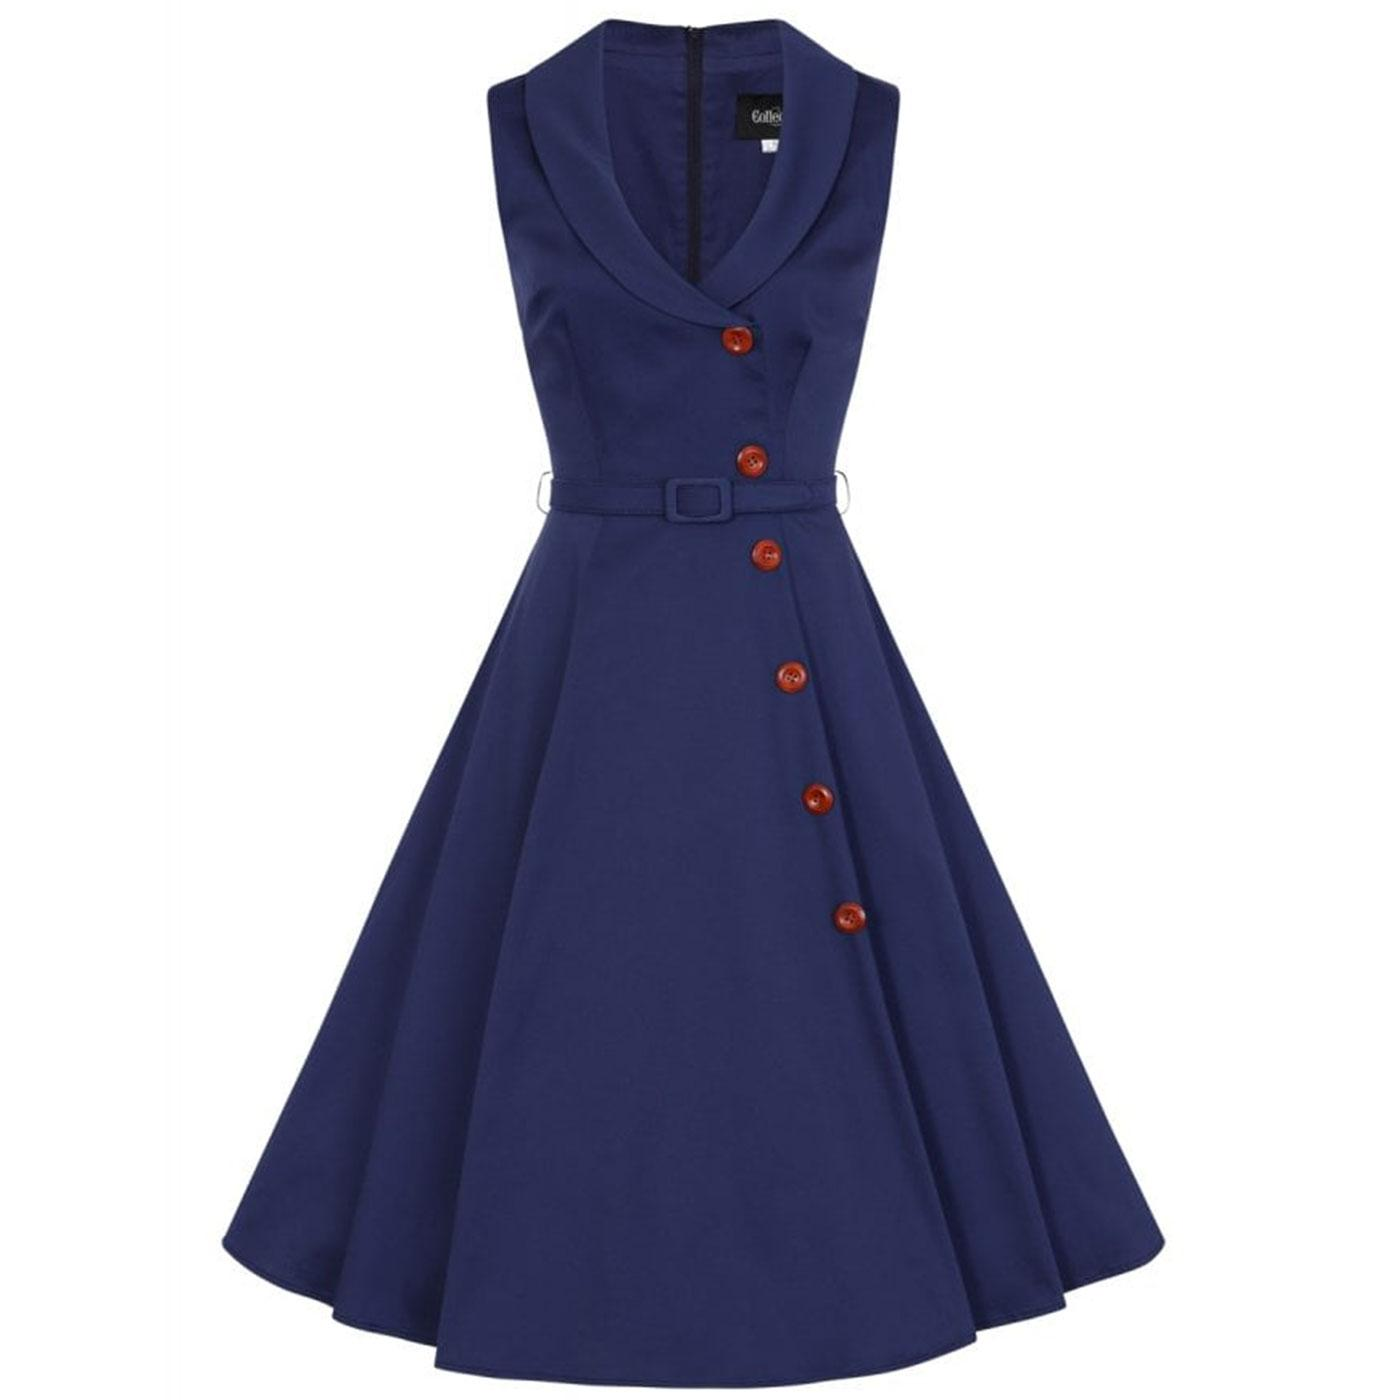 Sara COLLECTIF Retro 50s Summer Swing Dress - Navy